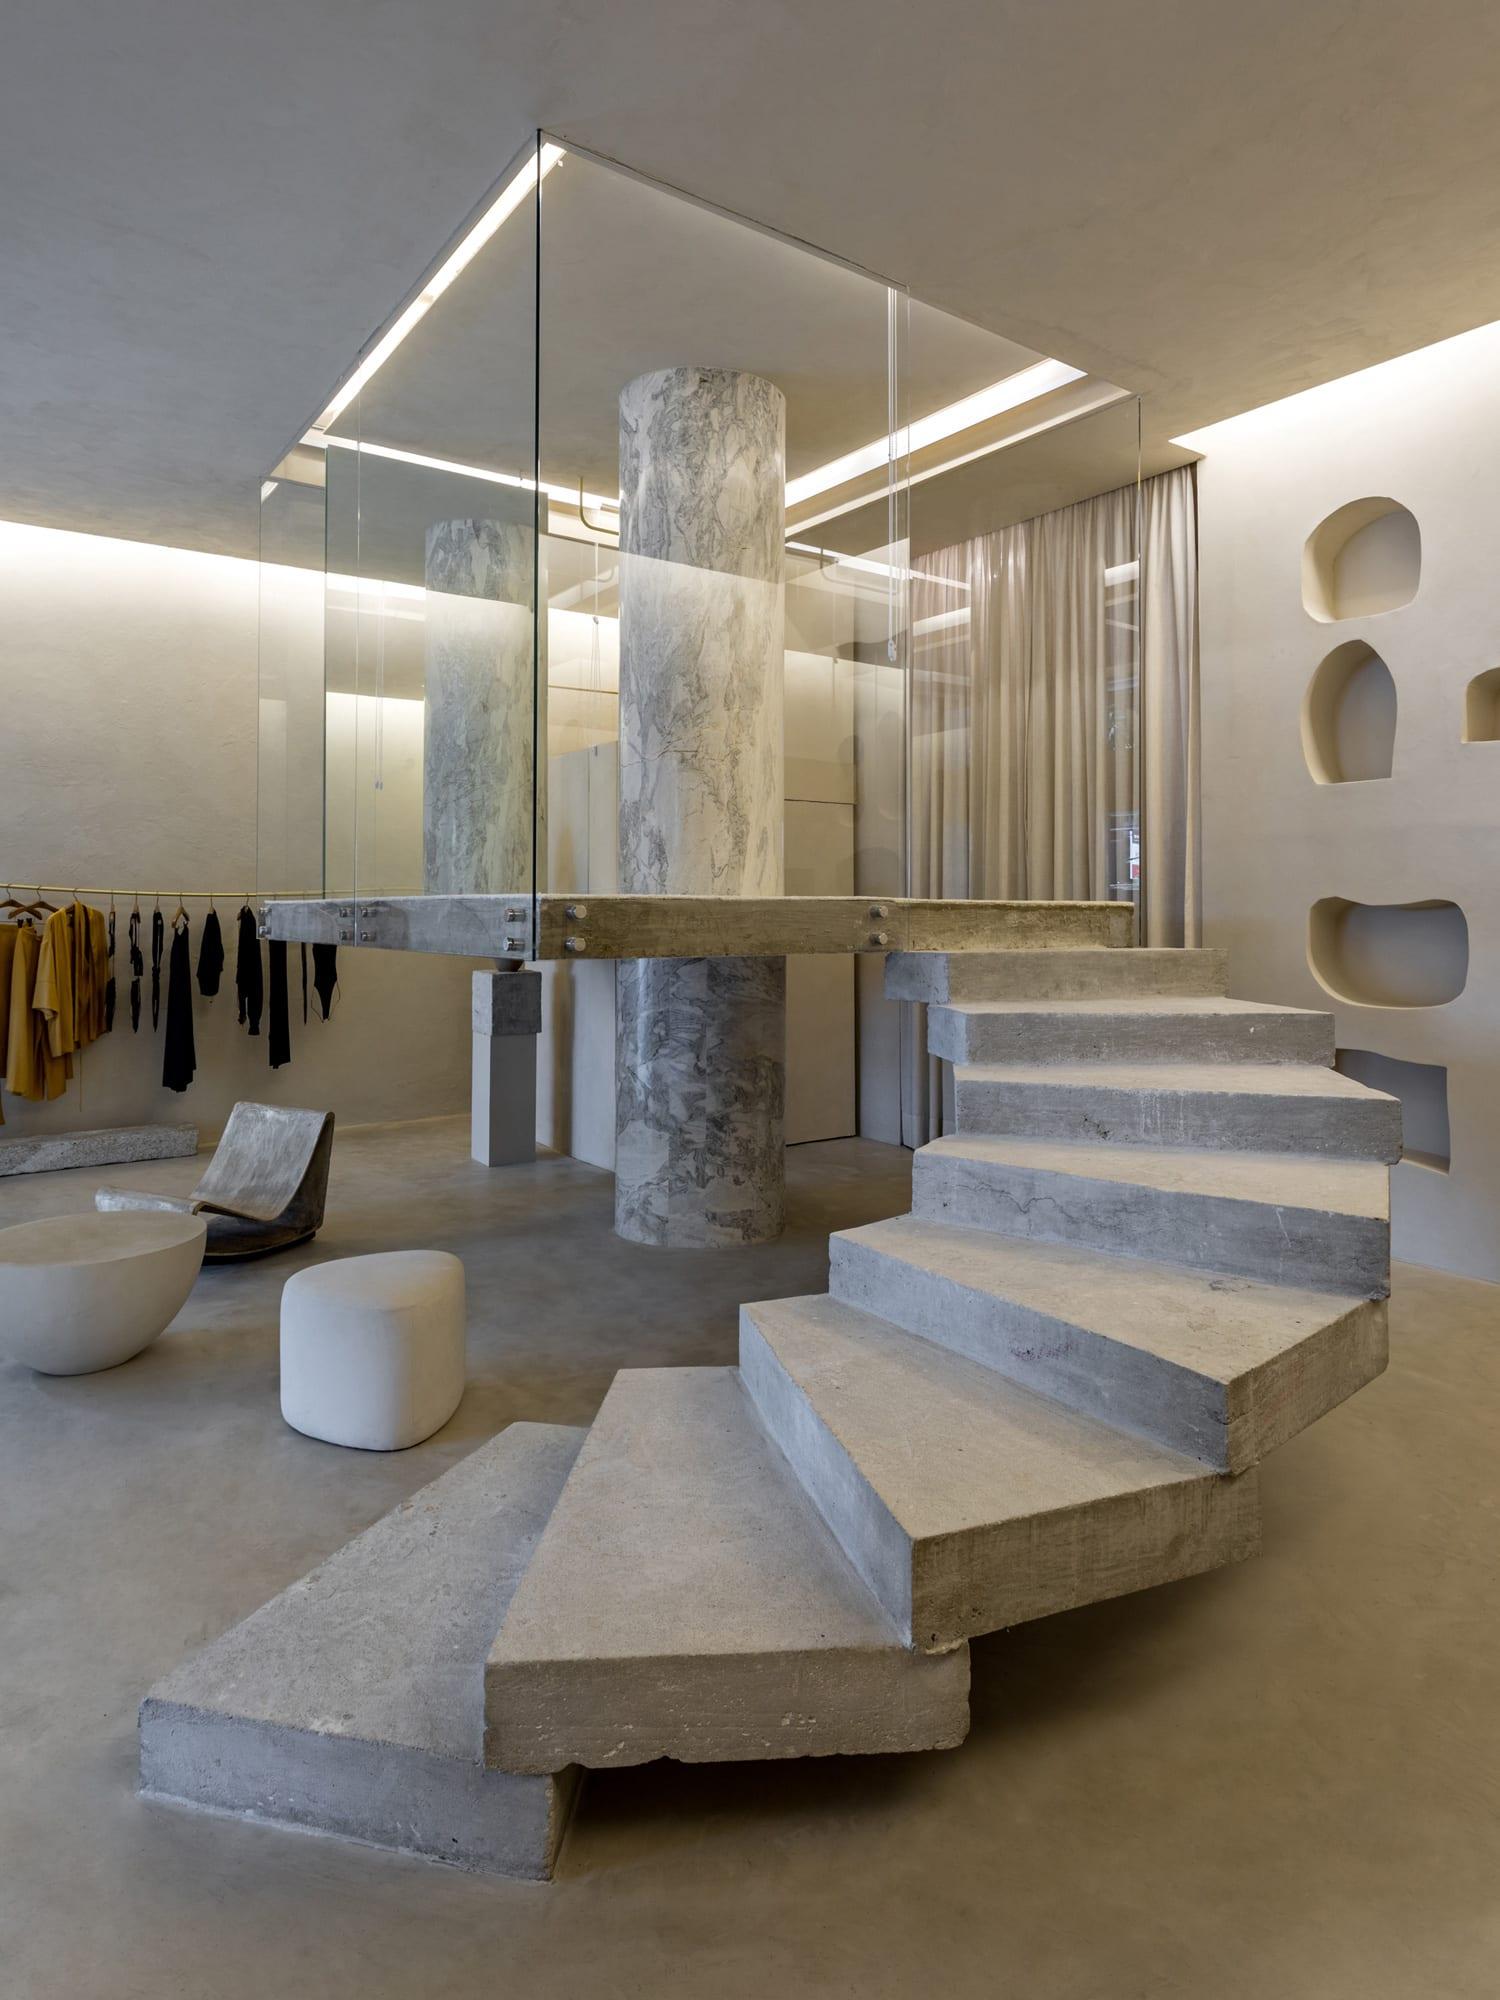 Organic Brutalism: Haight Fashion Store in Rio de Janeiro, Brazil by MNMA Studio | Yellowtrace